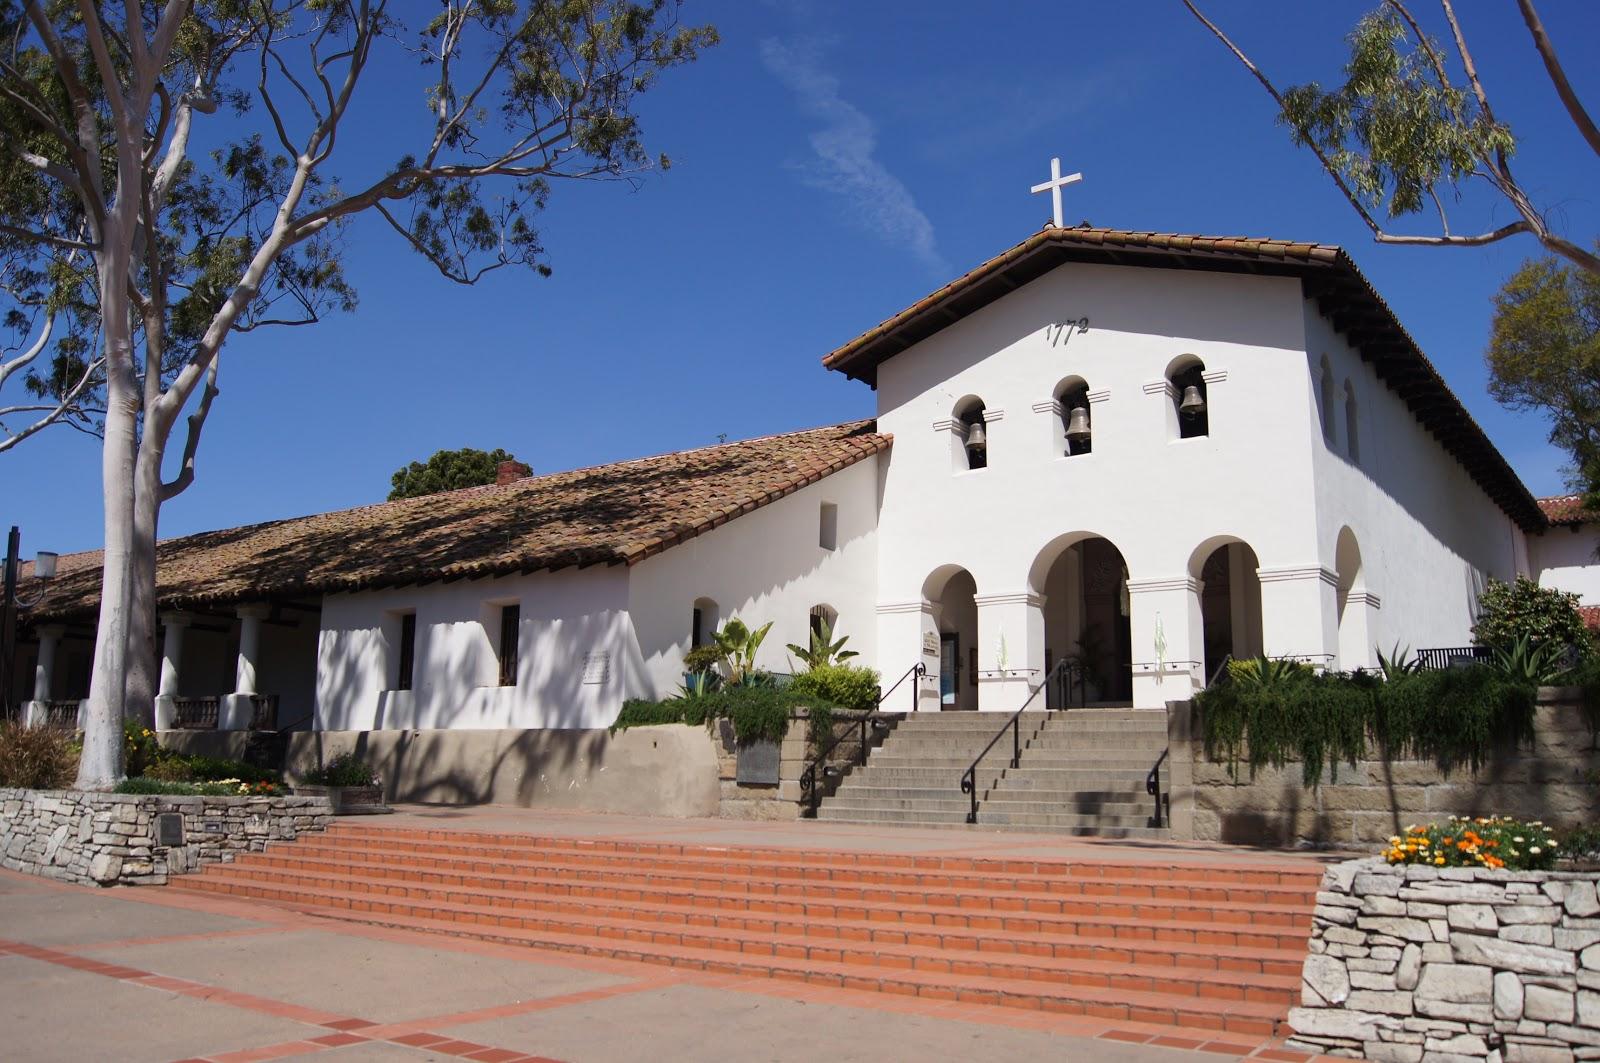 Mission san luis obispo de tolosa essay